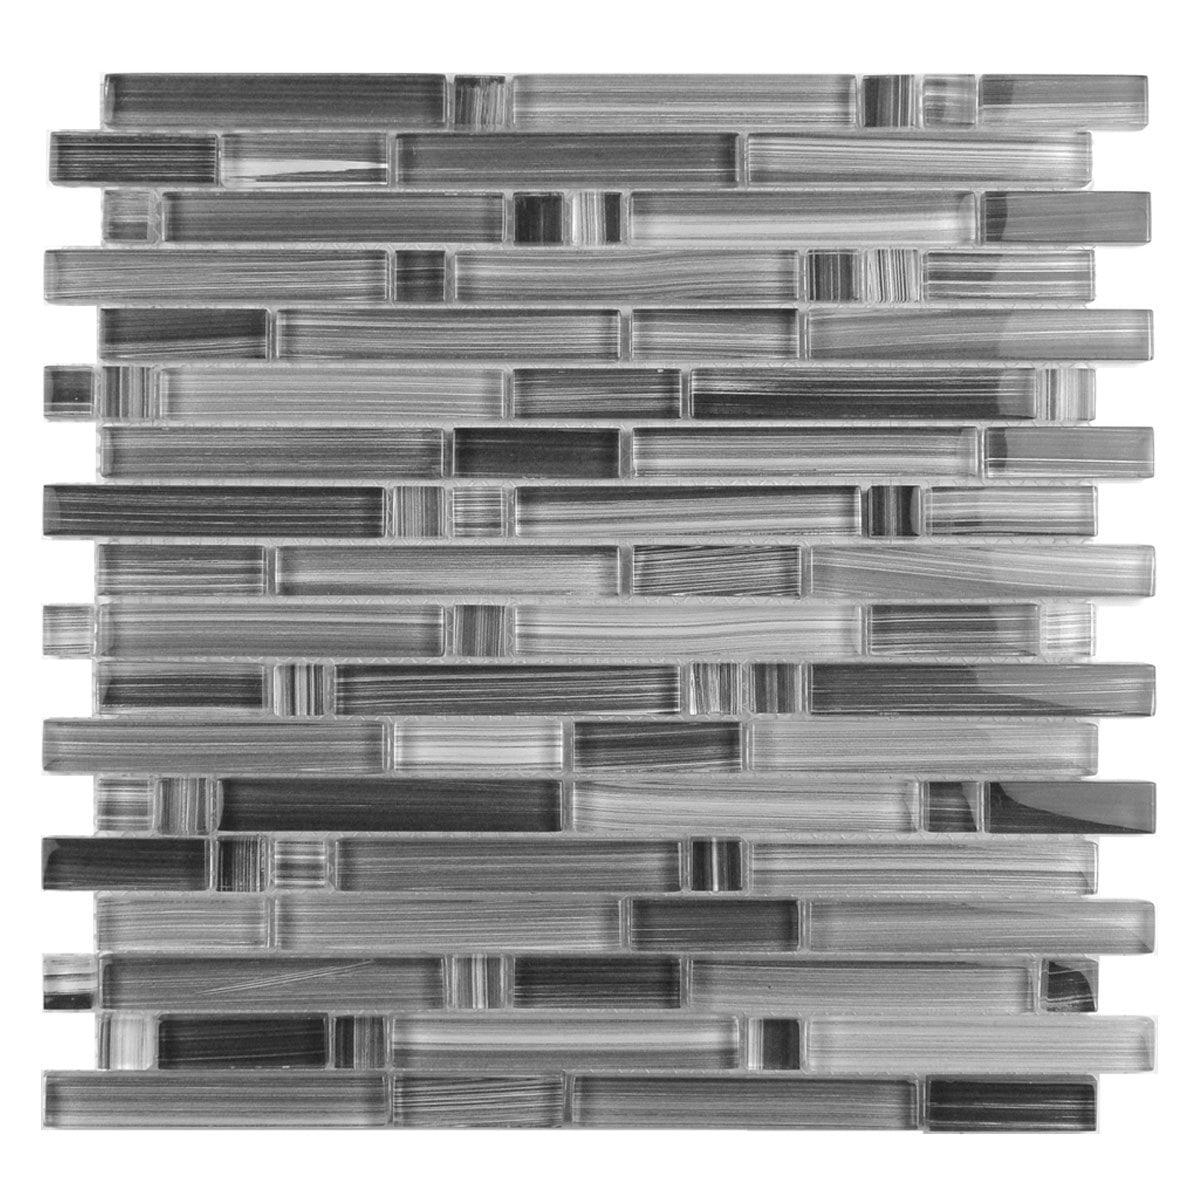 Caligraphy Linear / Linear Handicraft II 0